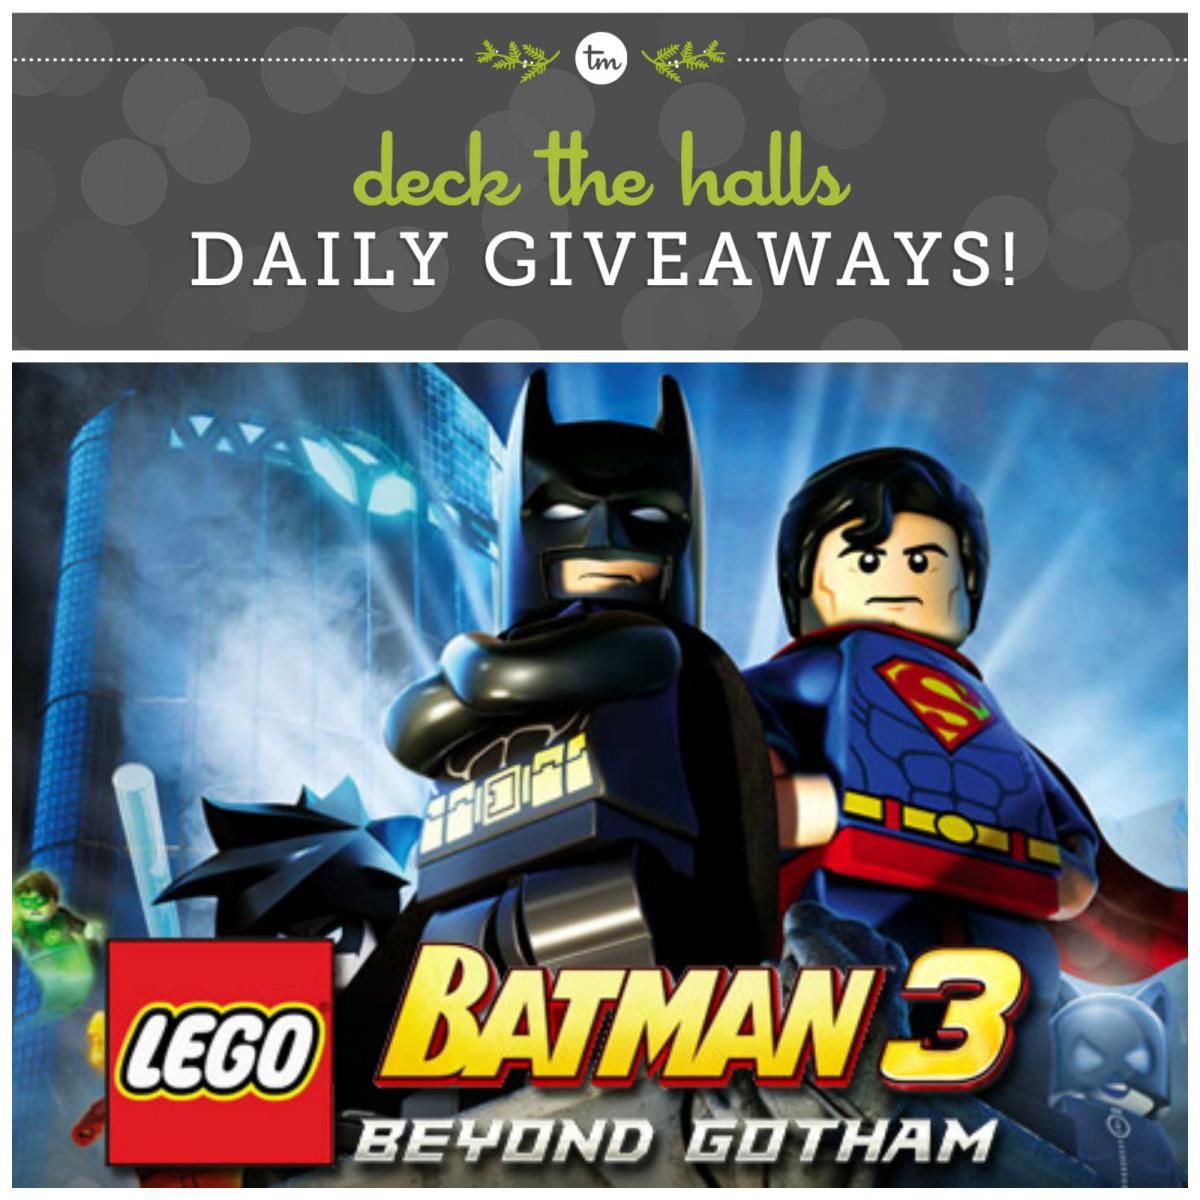 WIN Lego Batman 3 on TodaysMama.com!